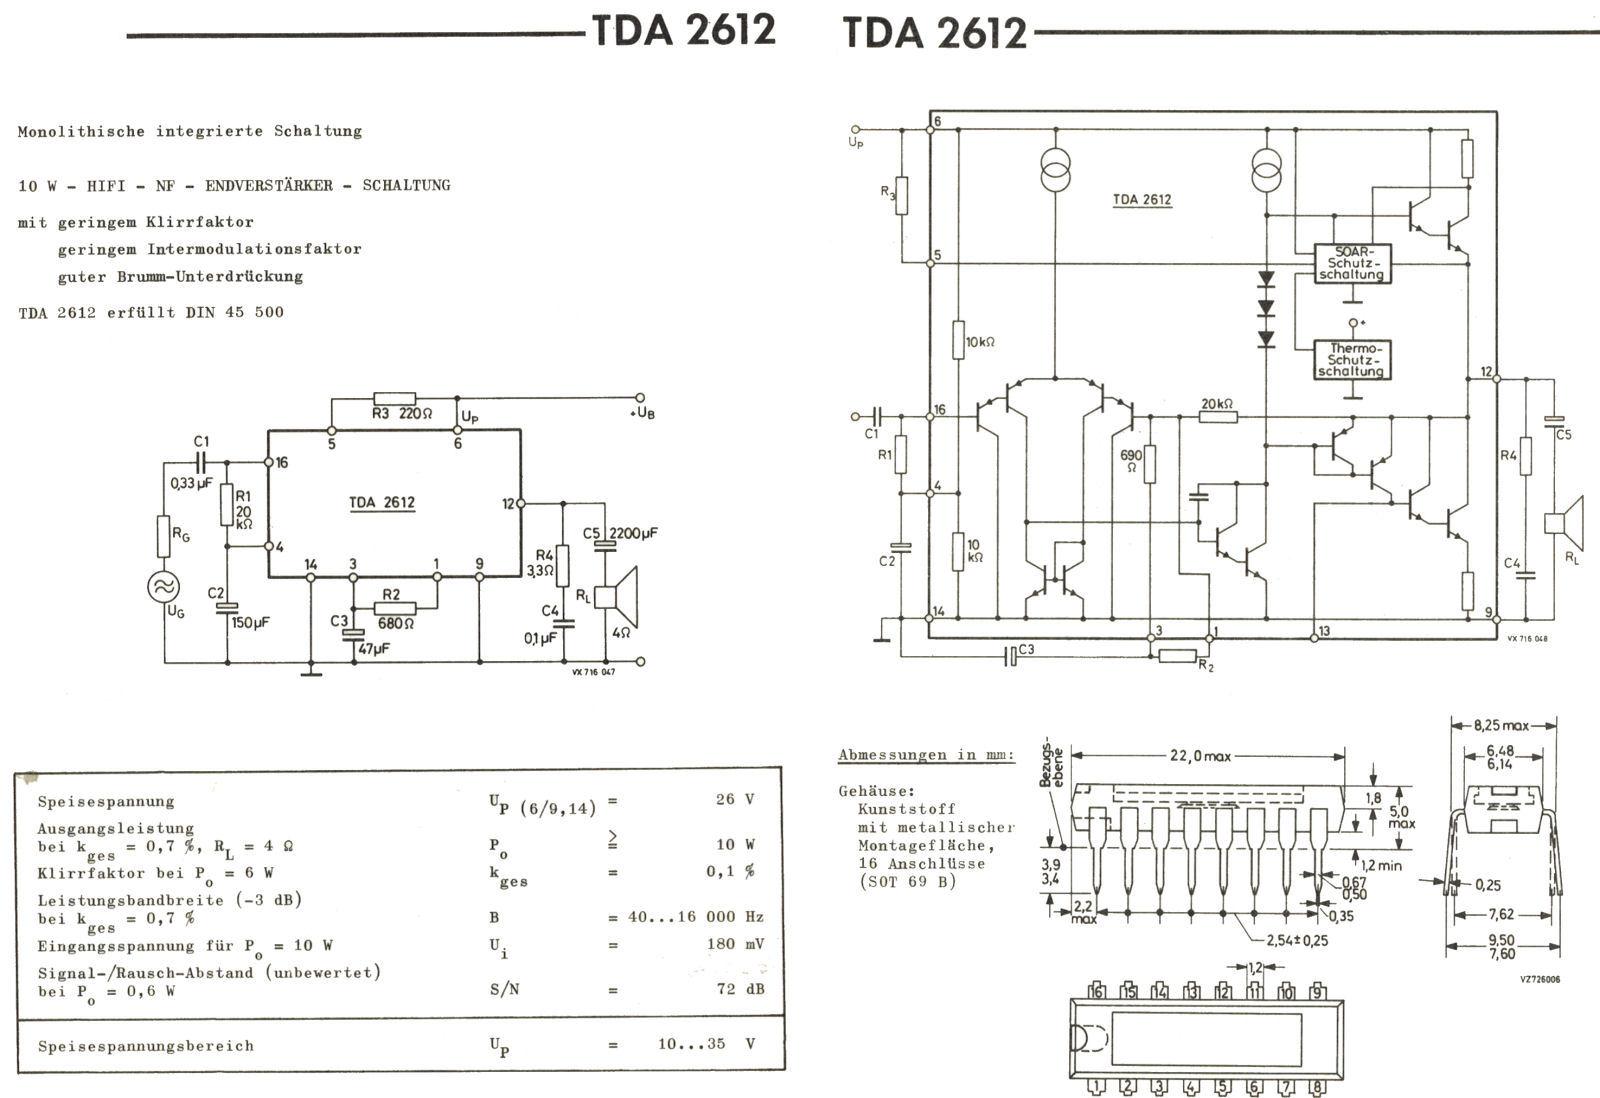 ic tda2612 specificationadvanced information for tda2612